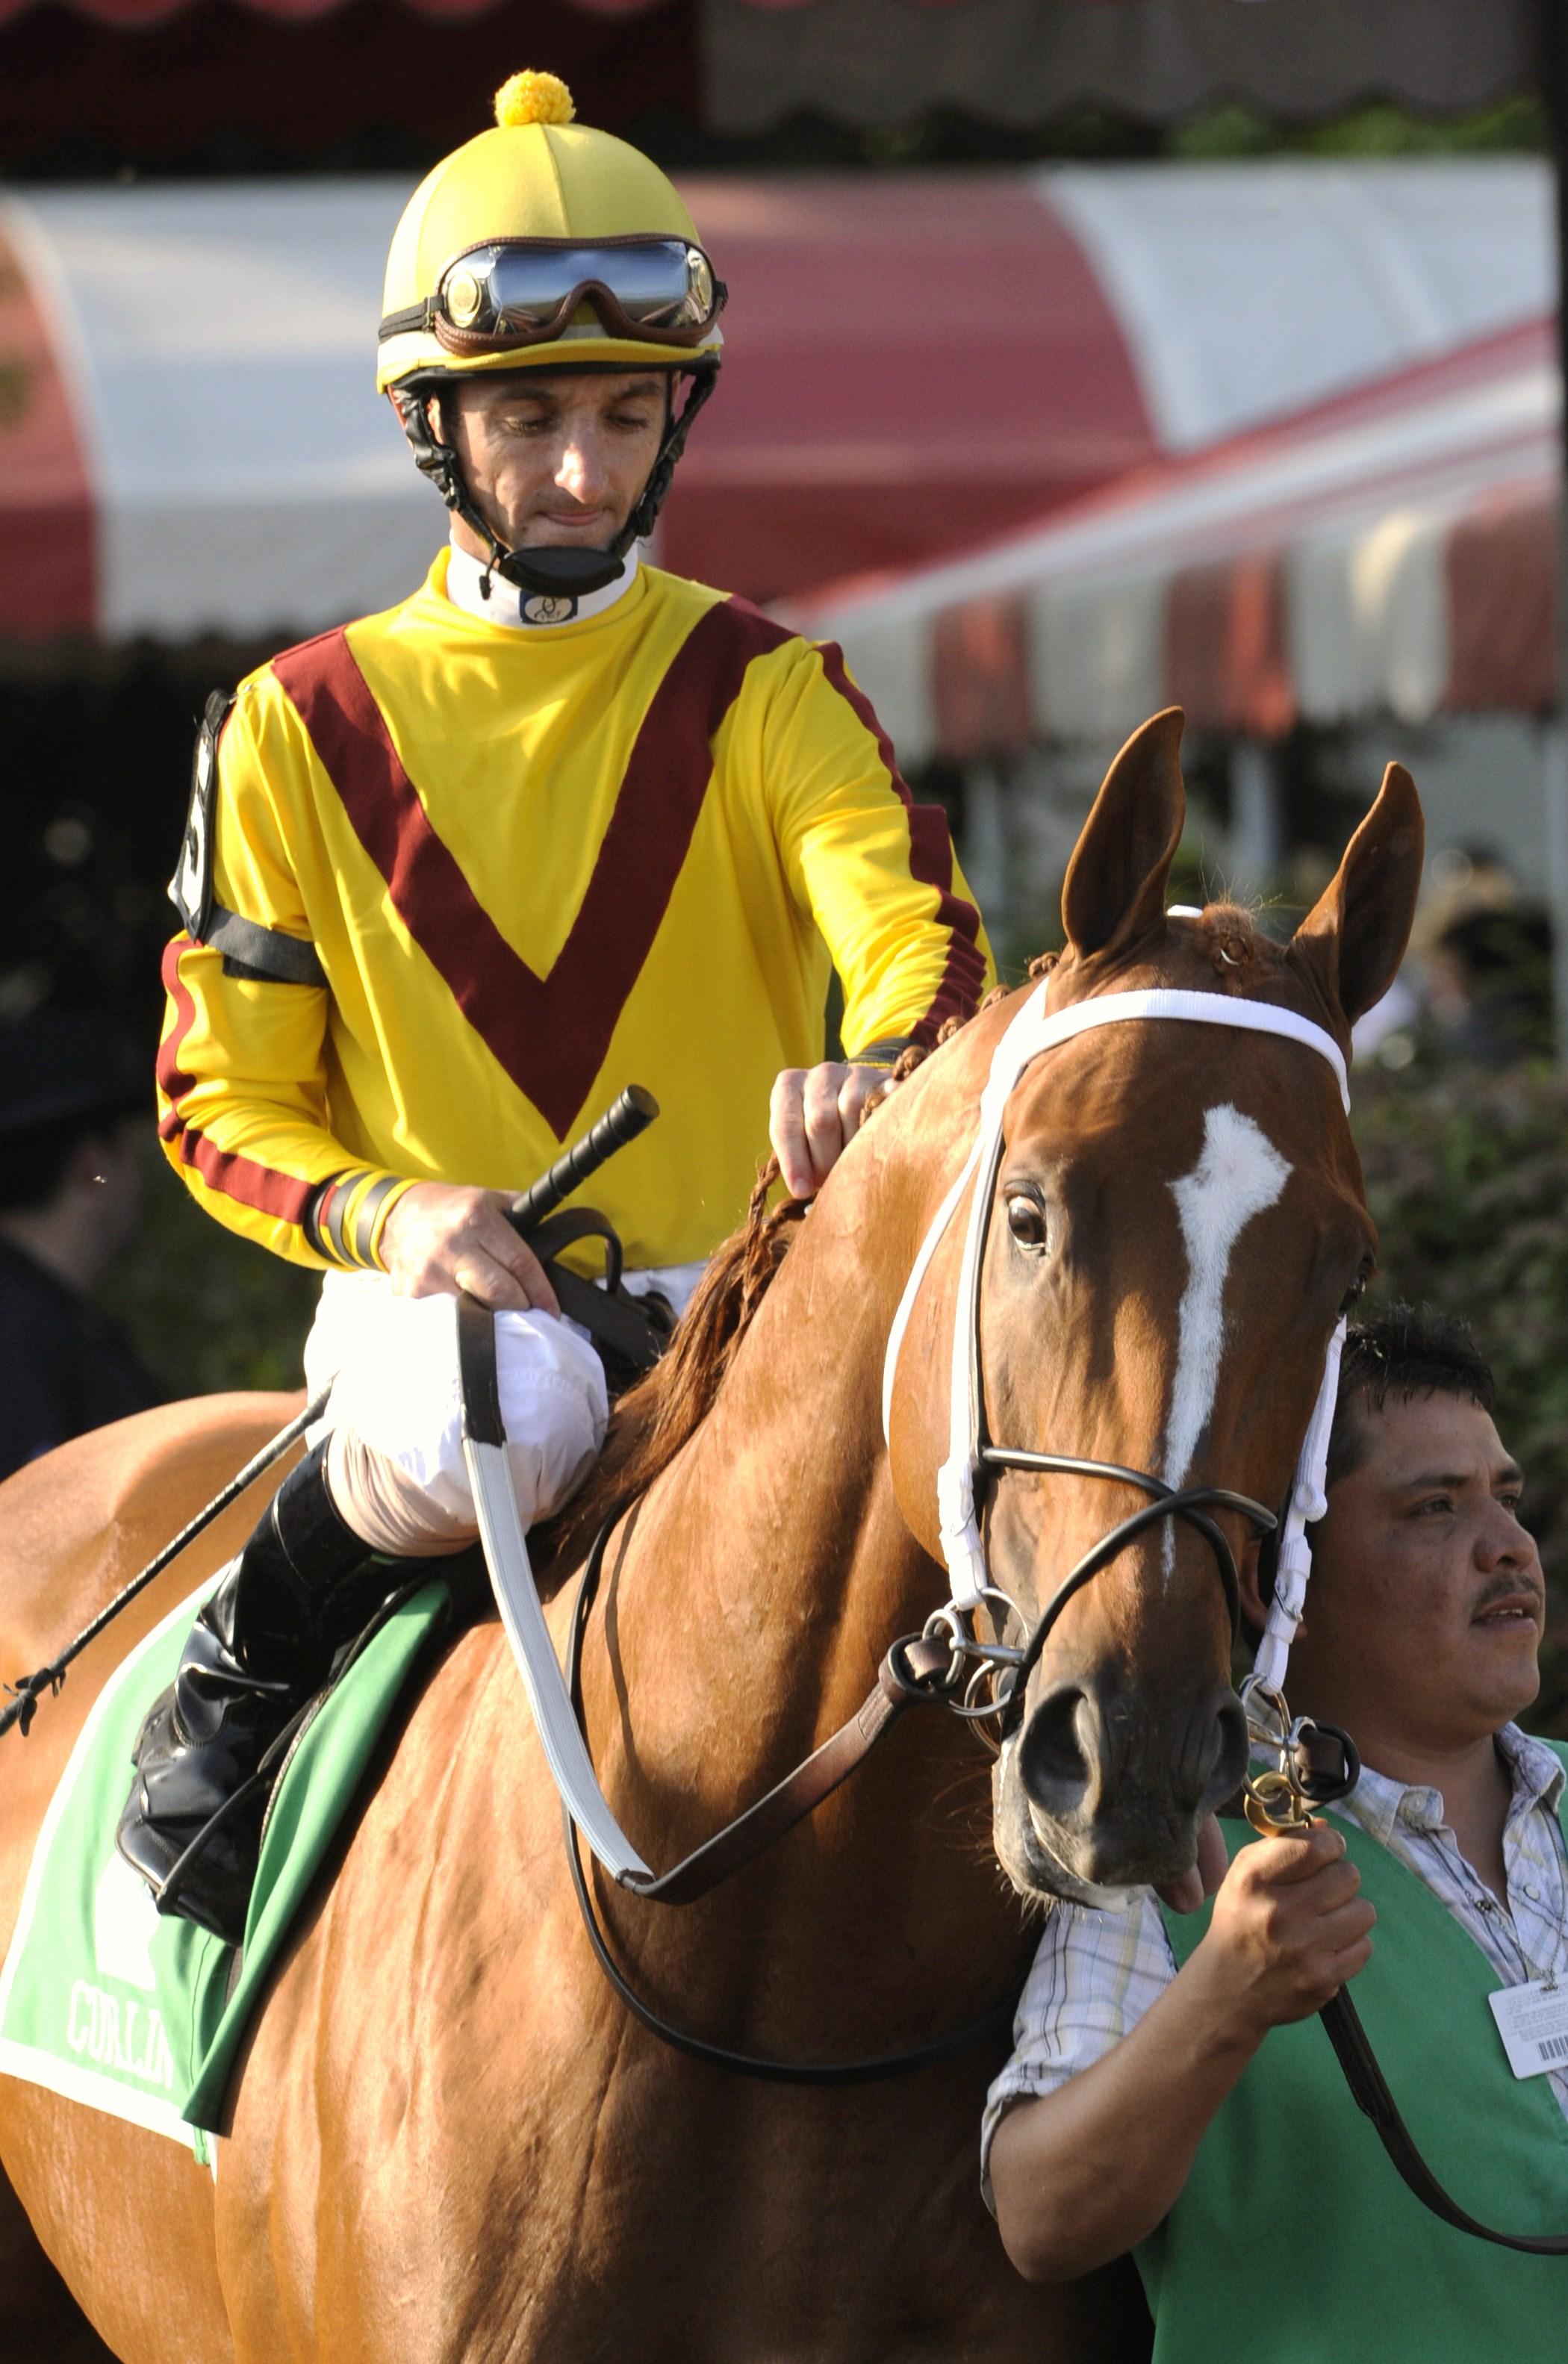 Curlin, Robby Albarado up, at Saratoga Race Course, 2008 (Skip Dickstein)